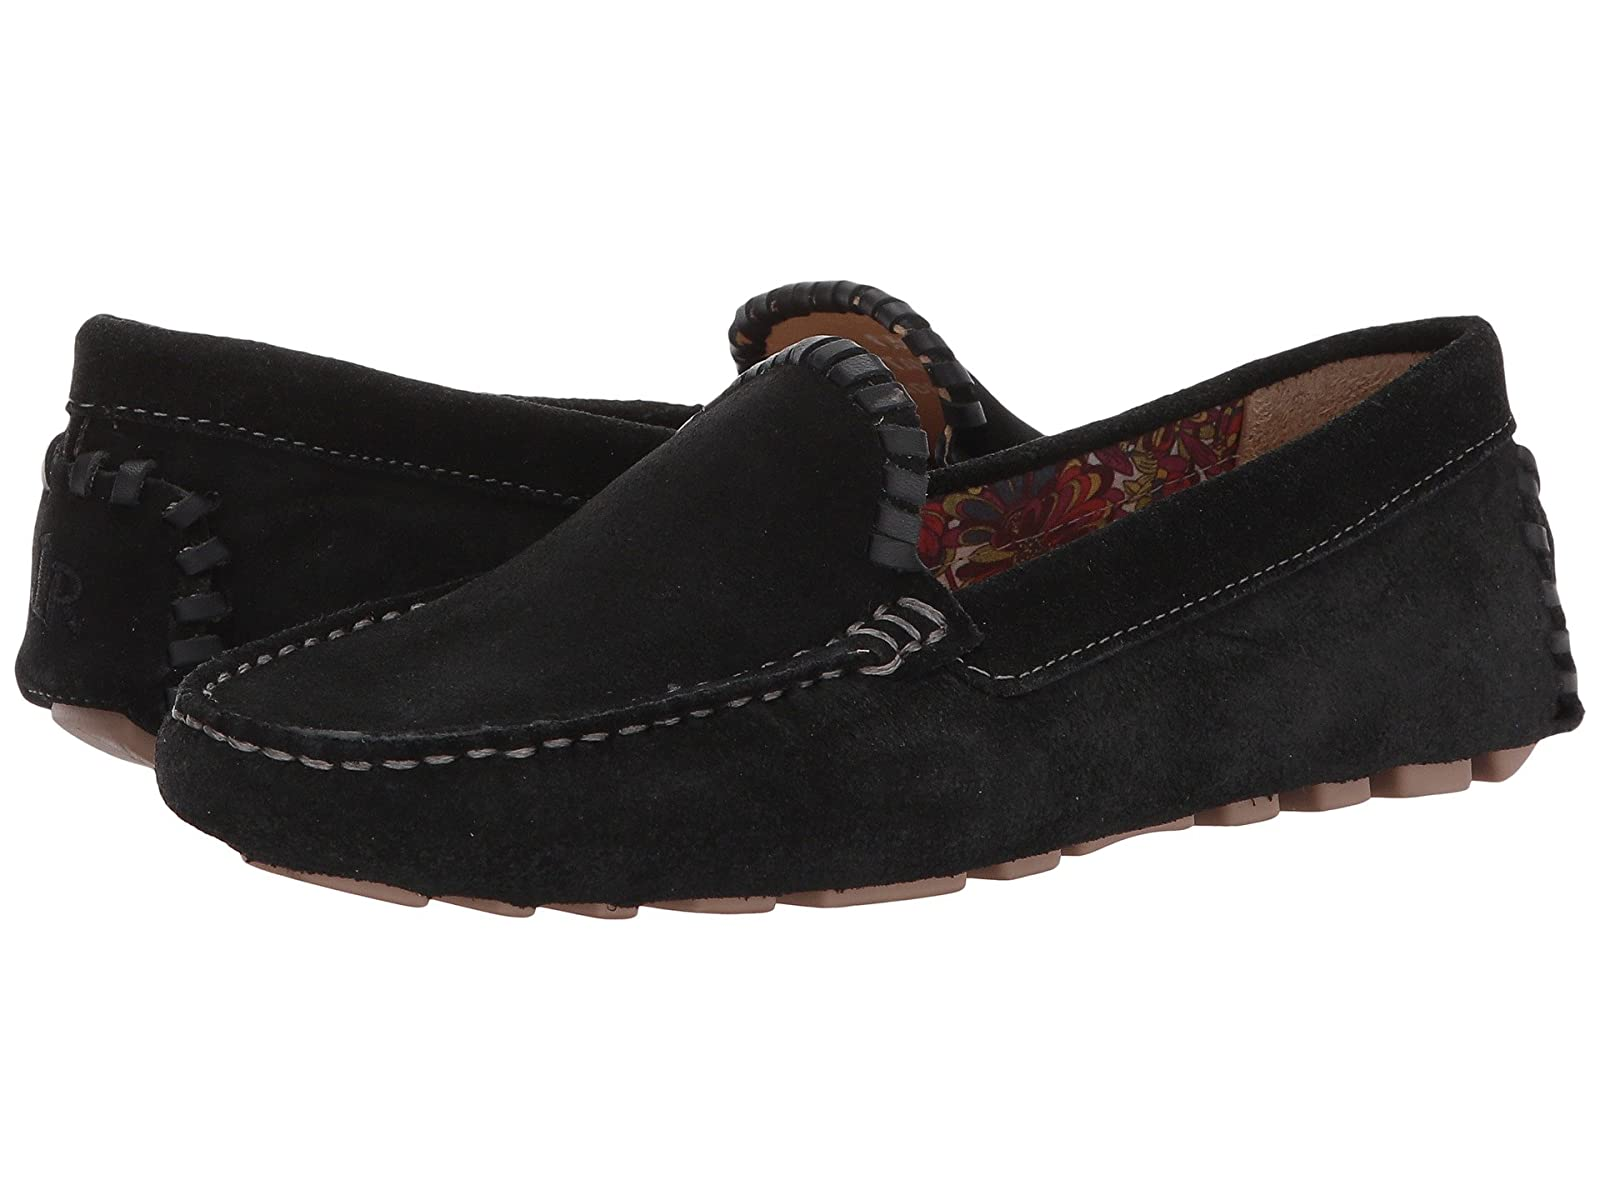 Jack Rogers Taylor SuedeAtmospheric grades have affordable shoes